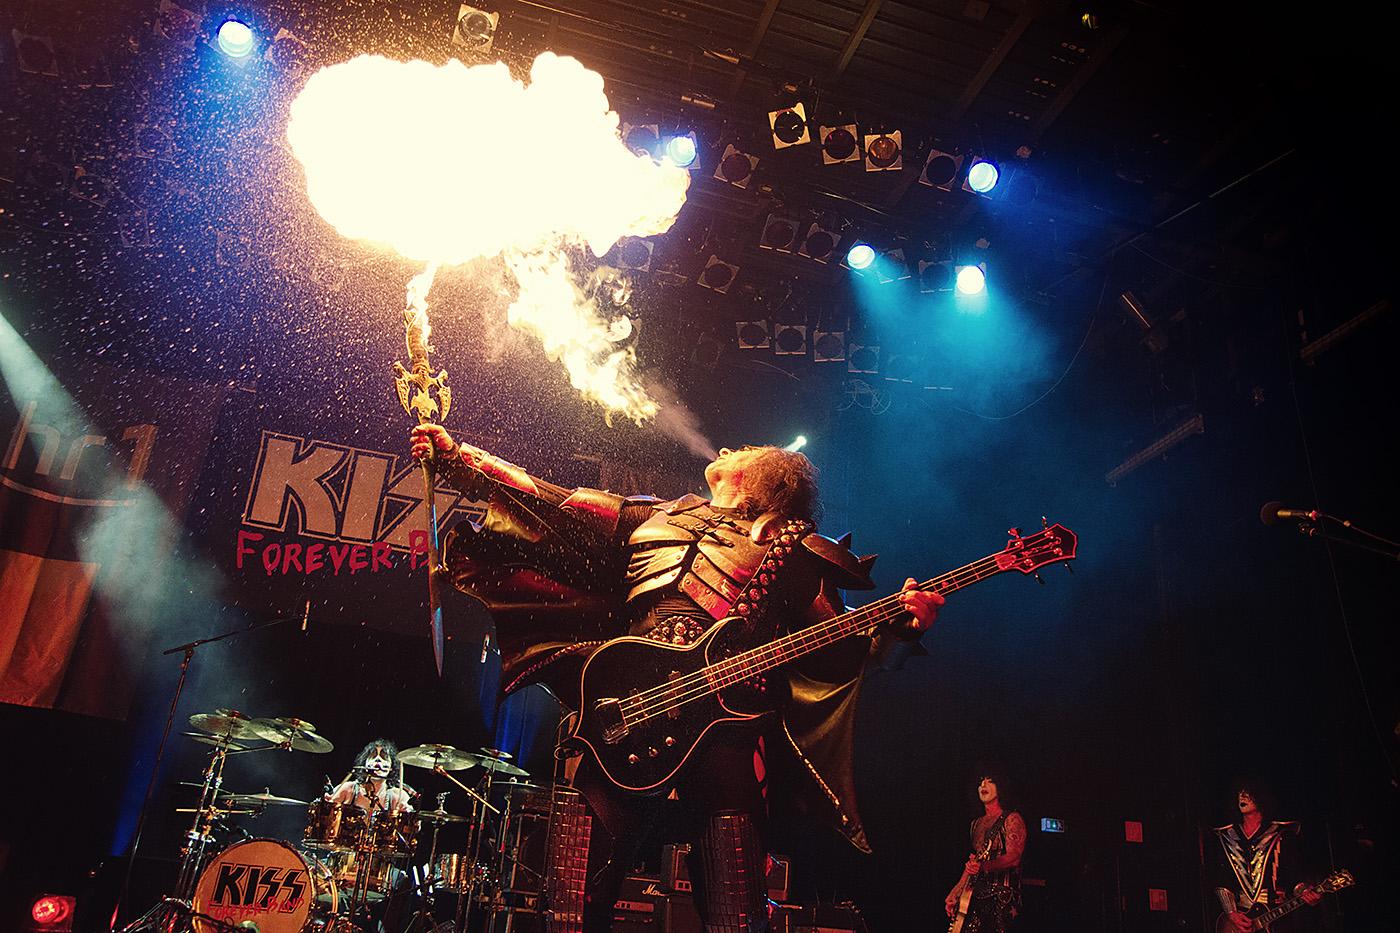 Kiss forever Band Open Doors Festival Zoltan Fuezfa